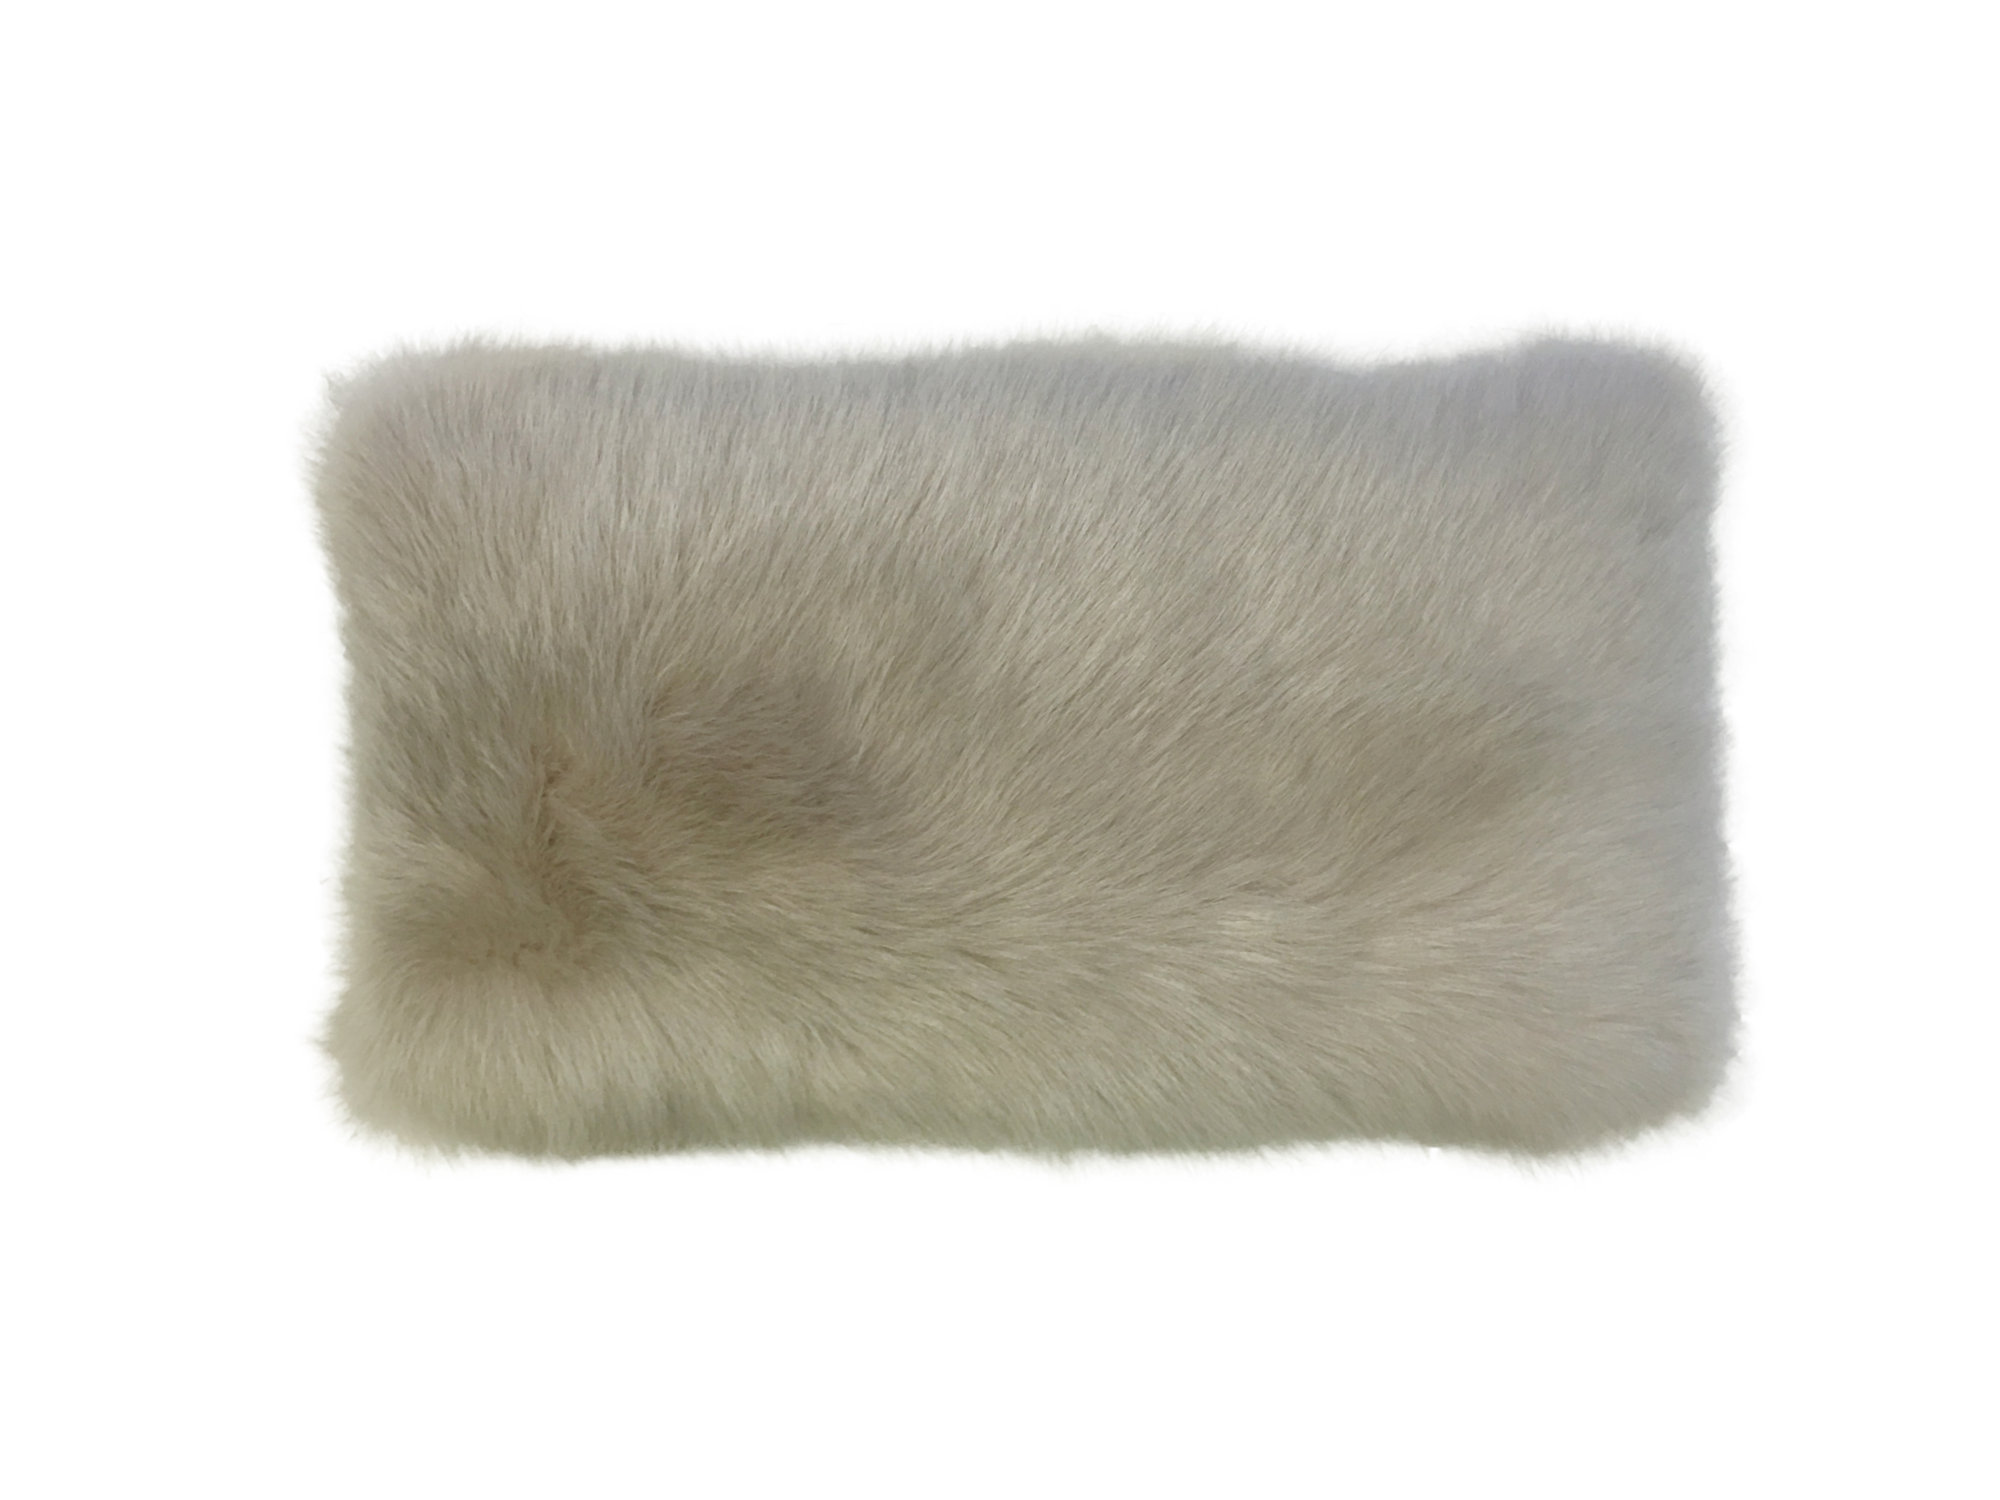 Shearling Pillow-Tortura-30x50cm-SPTORS2543050 - ANVOGG FEEL SHEARLING | ANVOGG